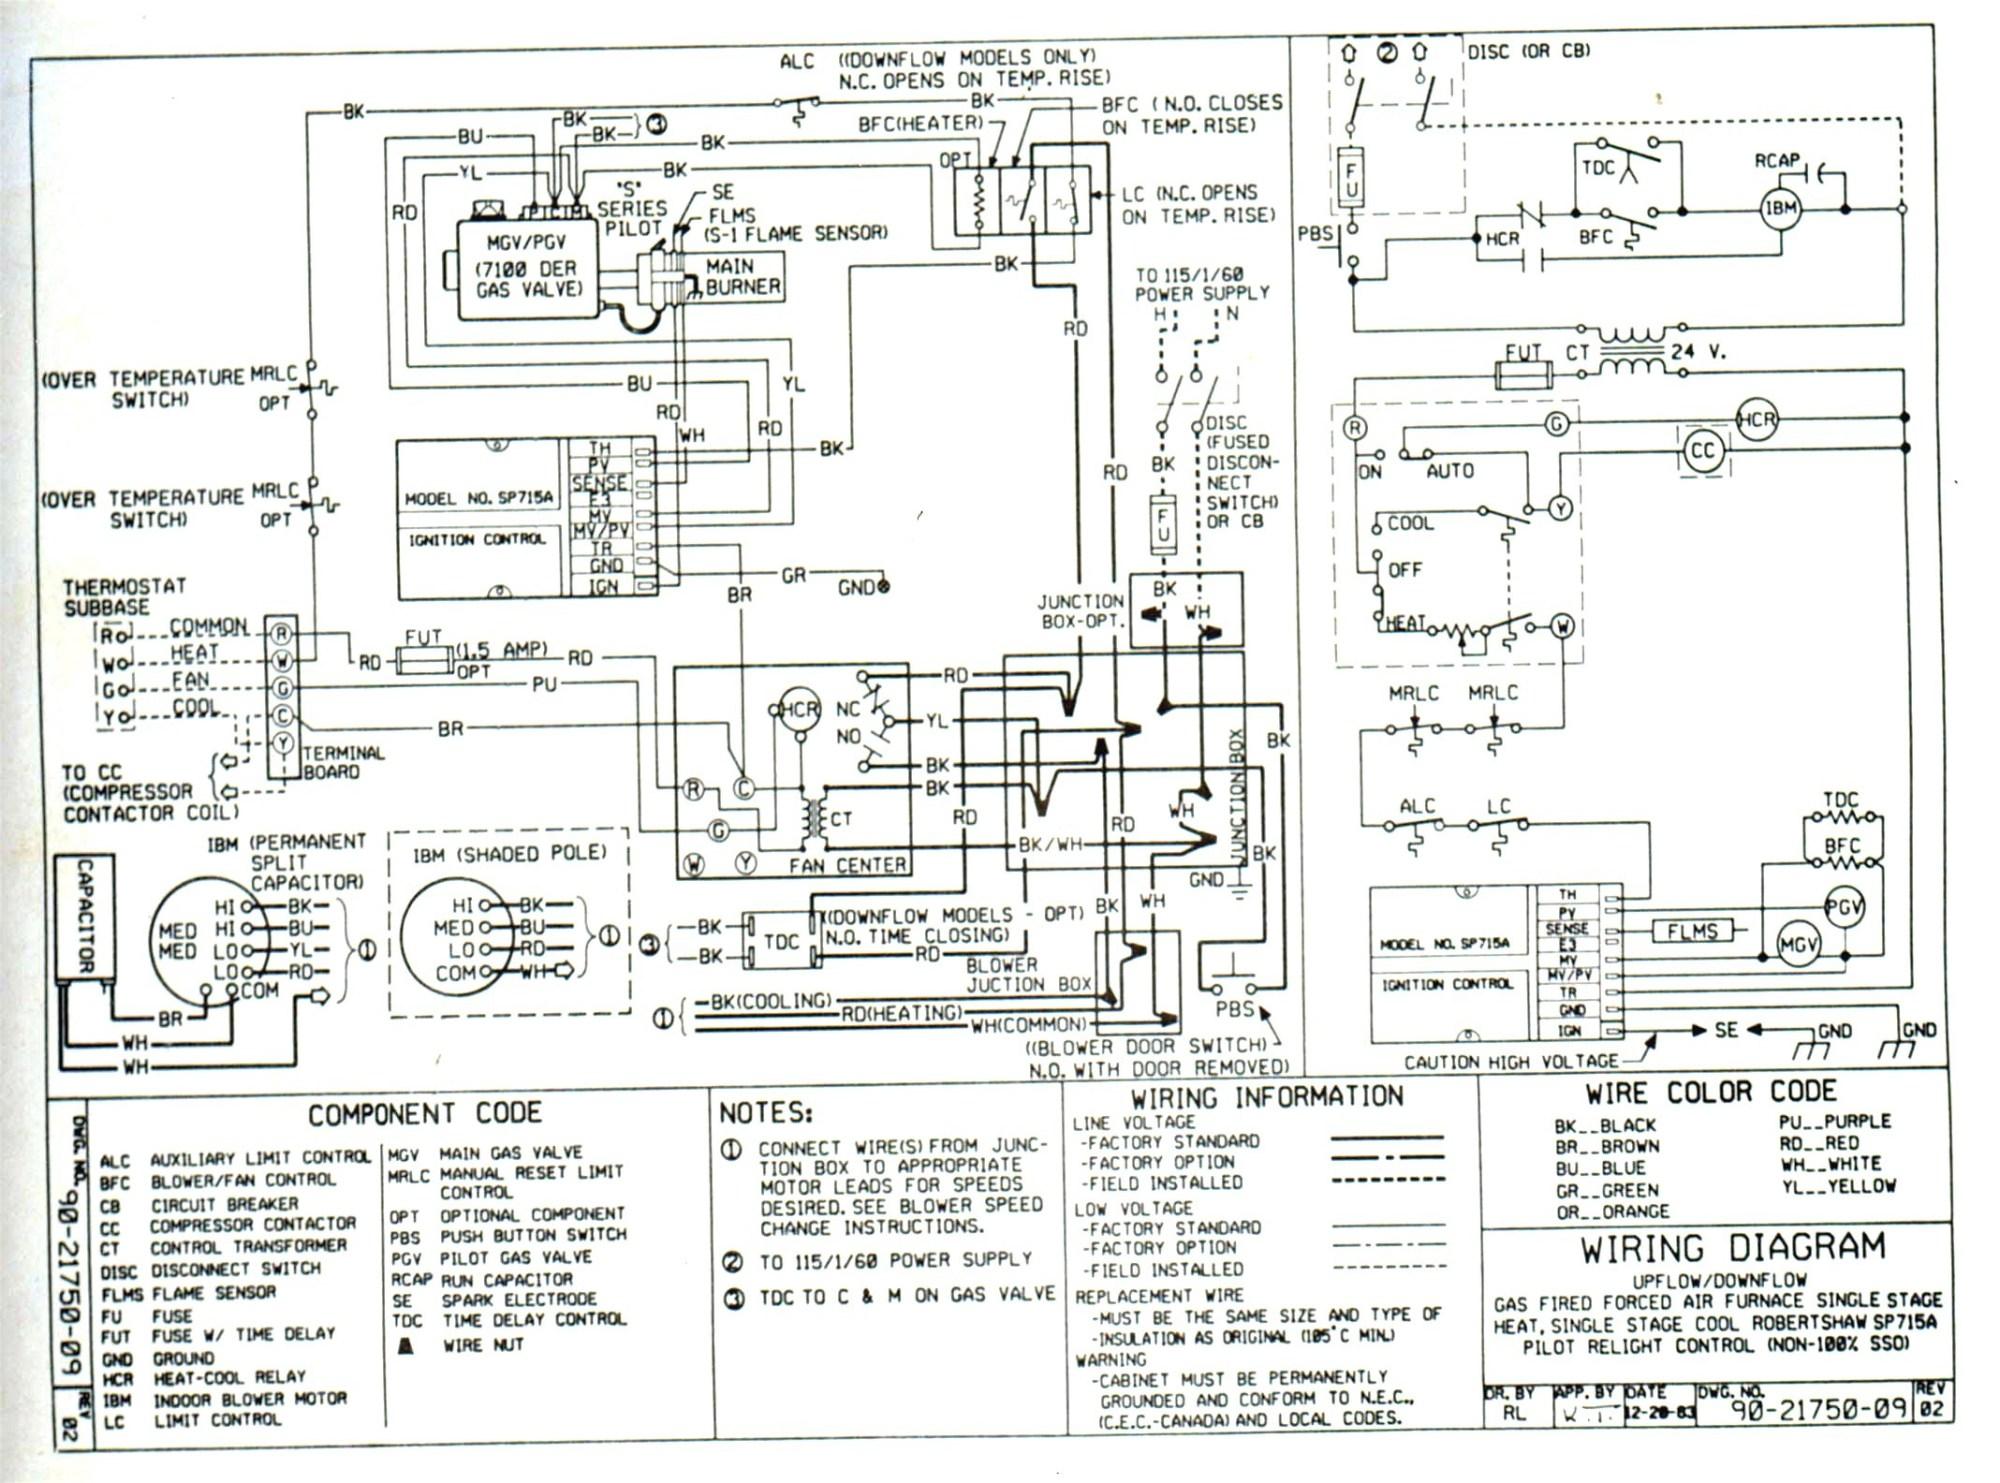 hight resolution of intertherm ac unit wiring diagram download heil ac wiring diagram fresh intertherm diagram electric wiring